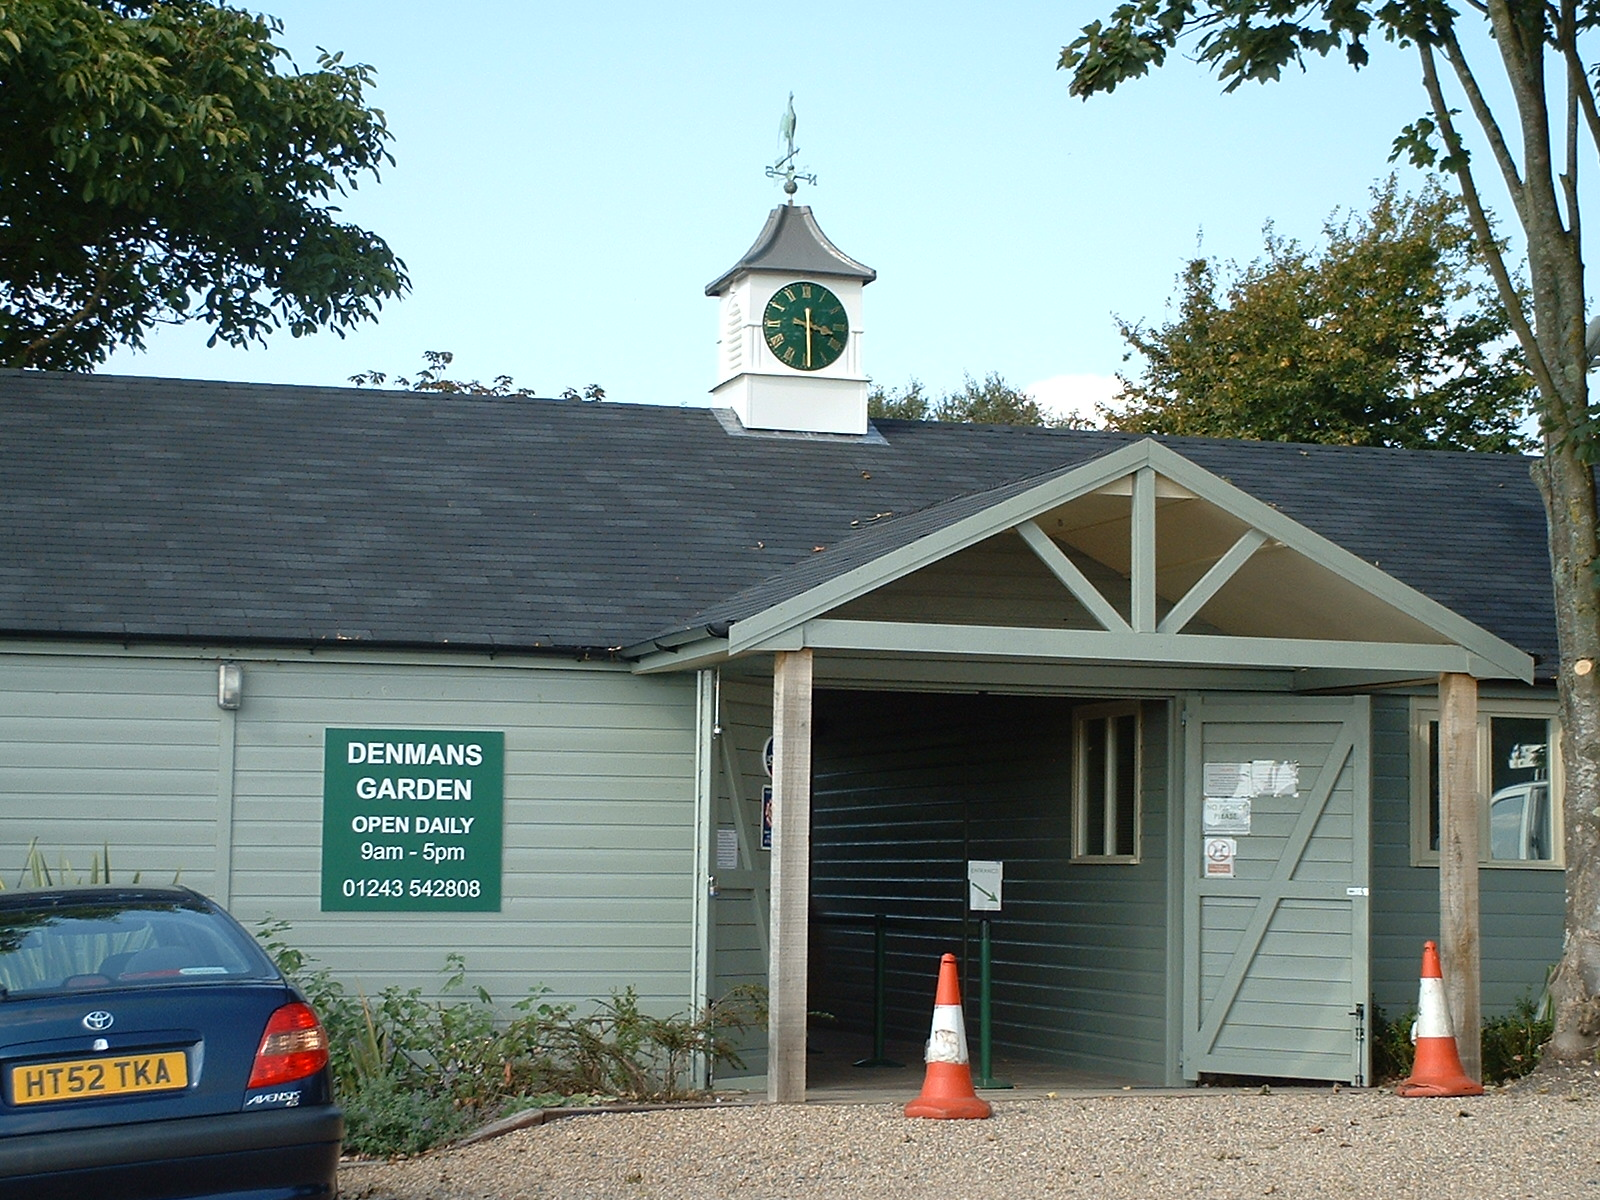 Clock towers on garden centres